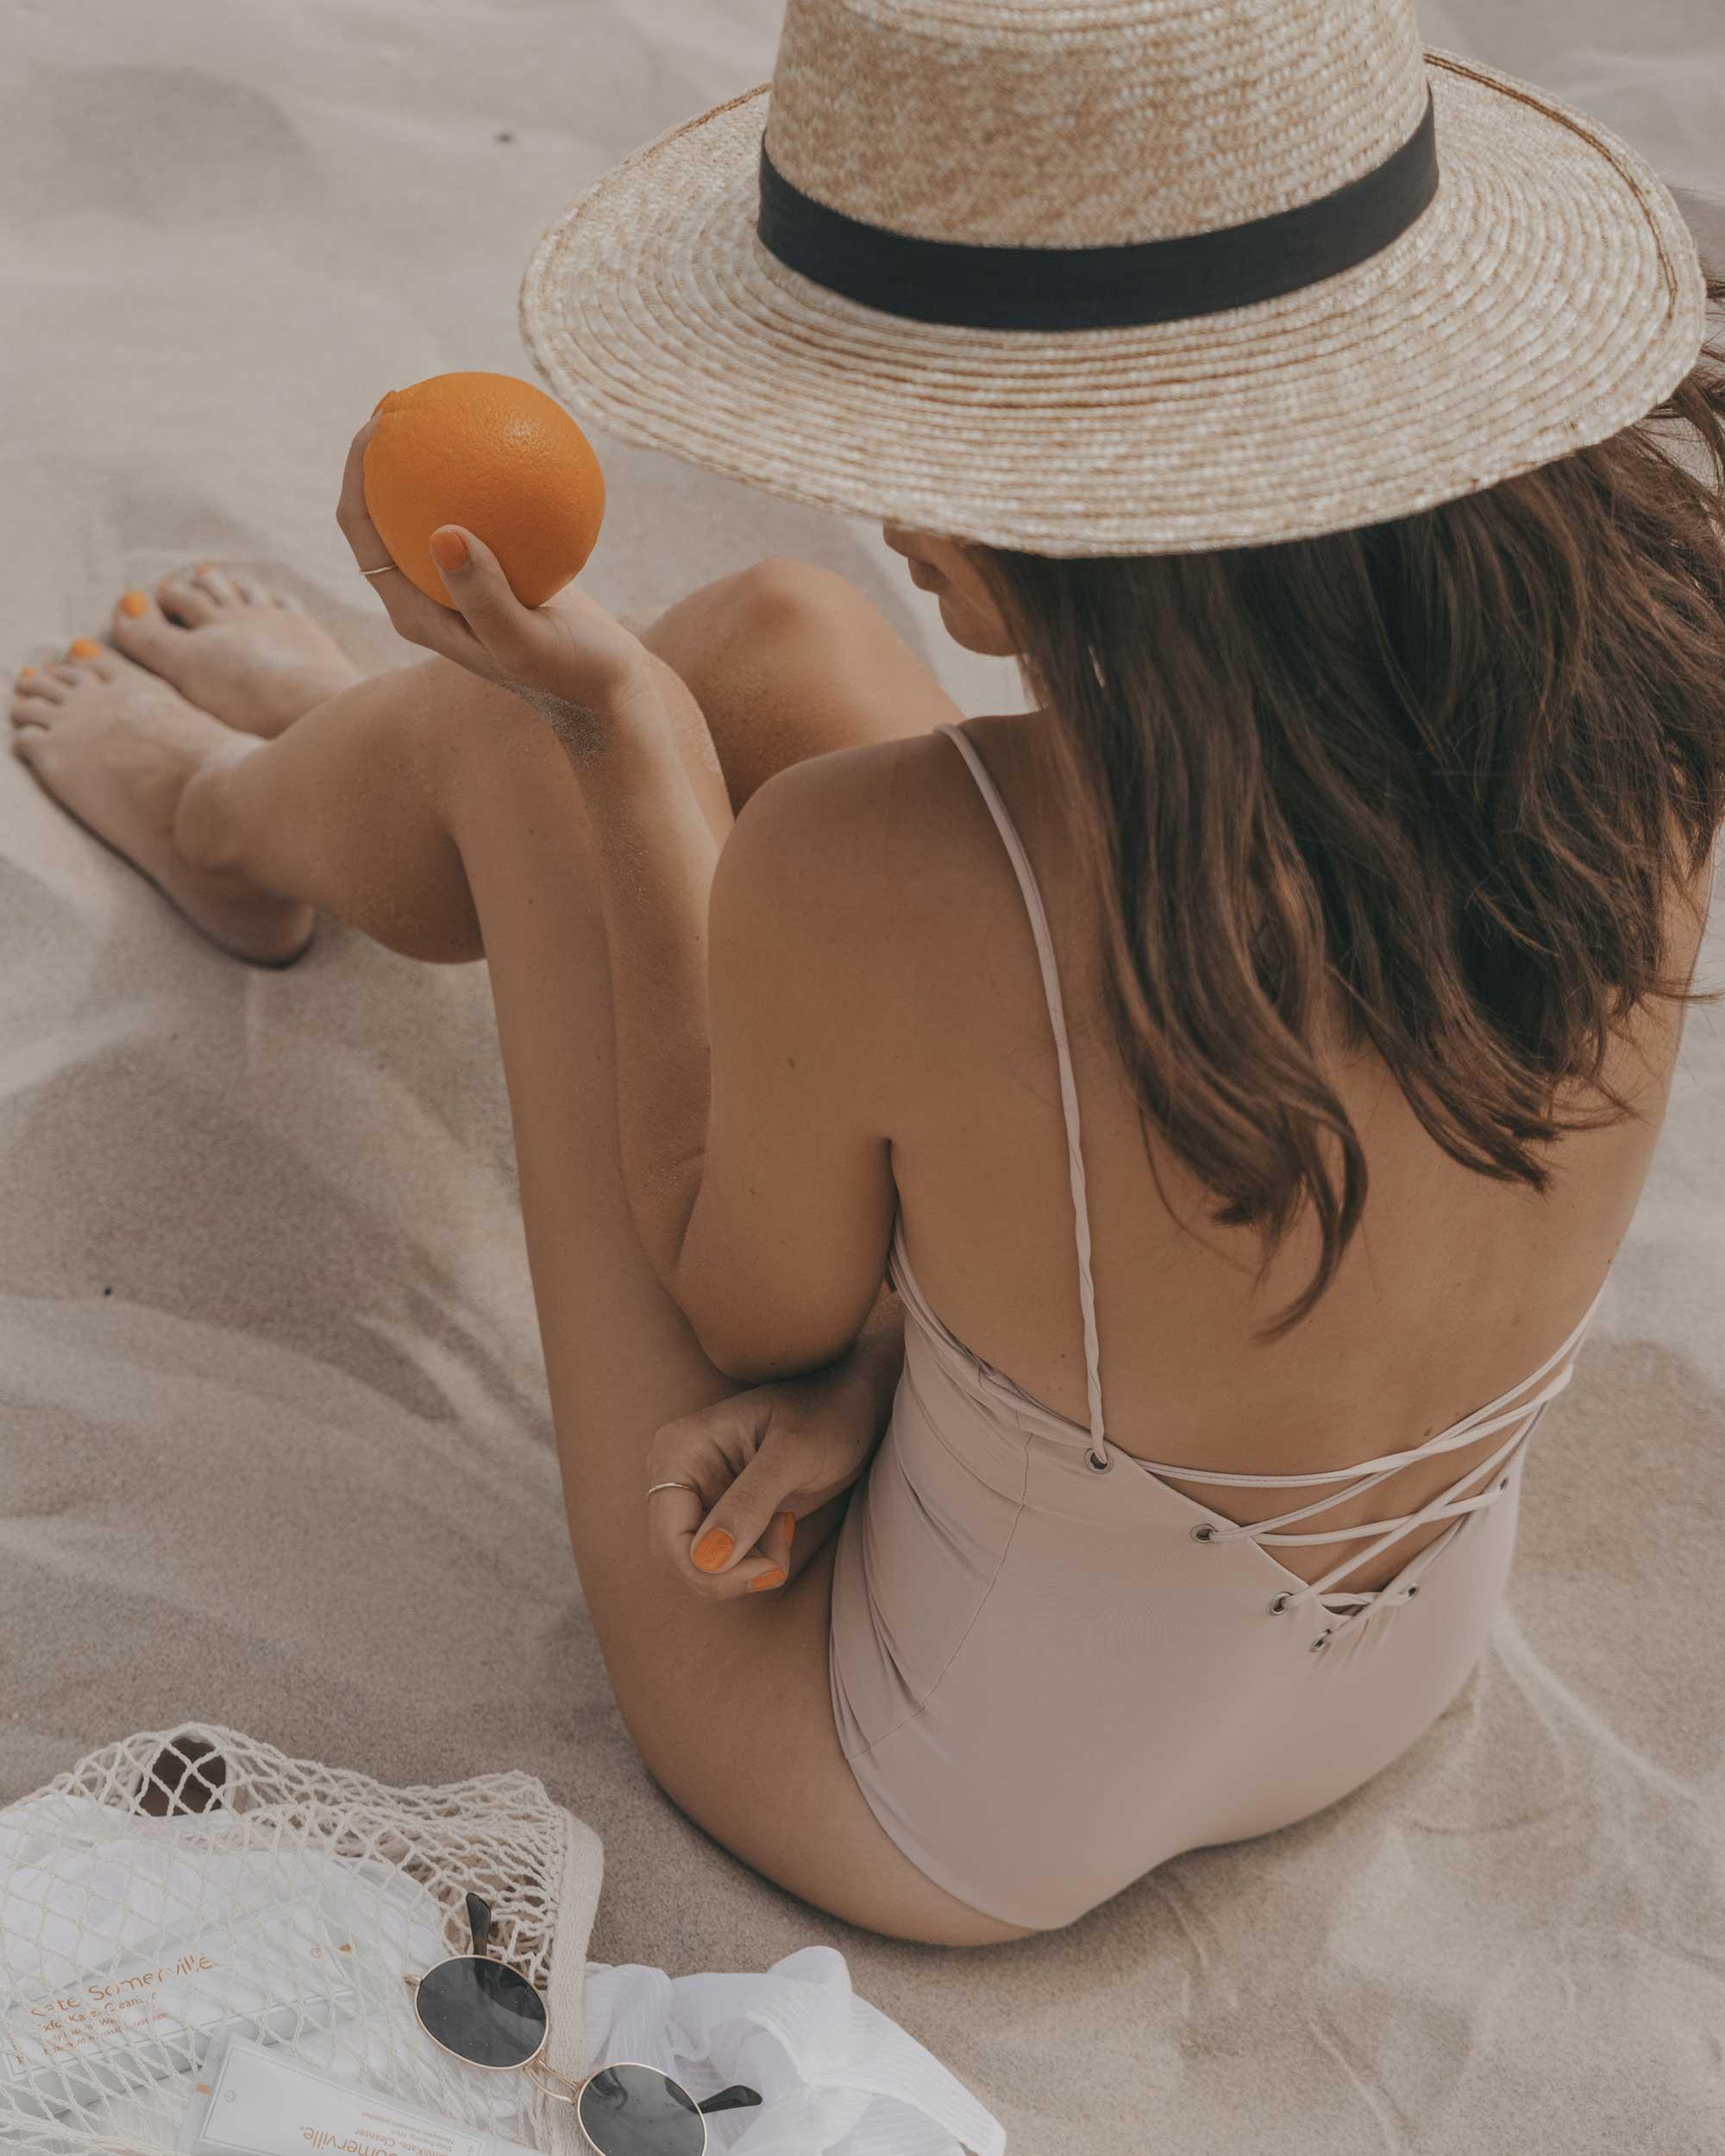 Tavik-swimwear-lace-up-front-one-piece-swimsuit-newport-beach-california-9.jpg